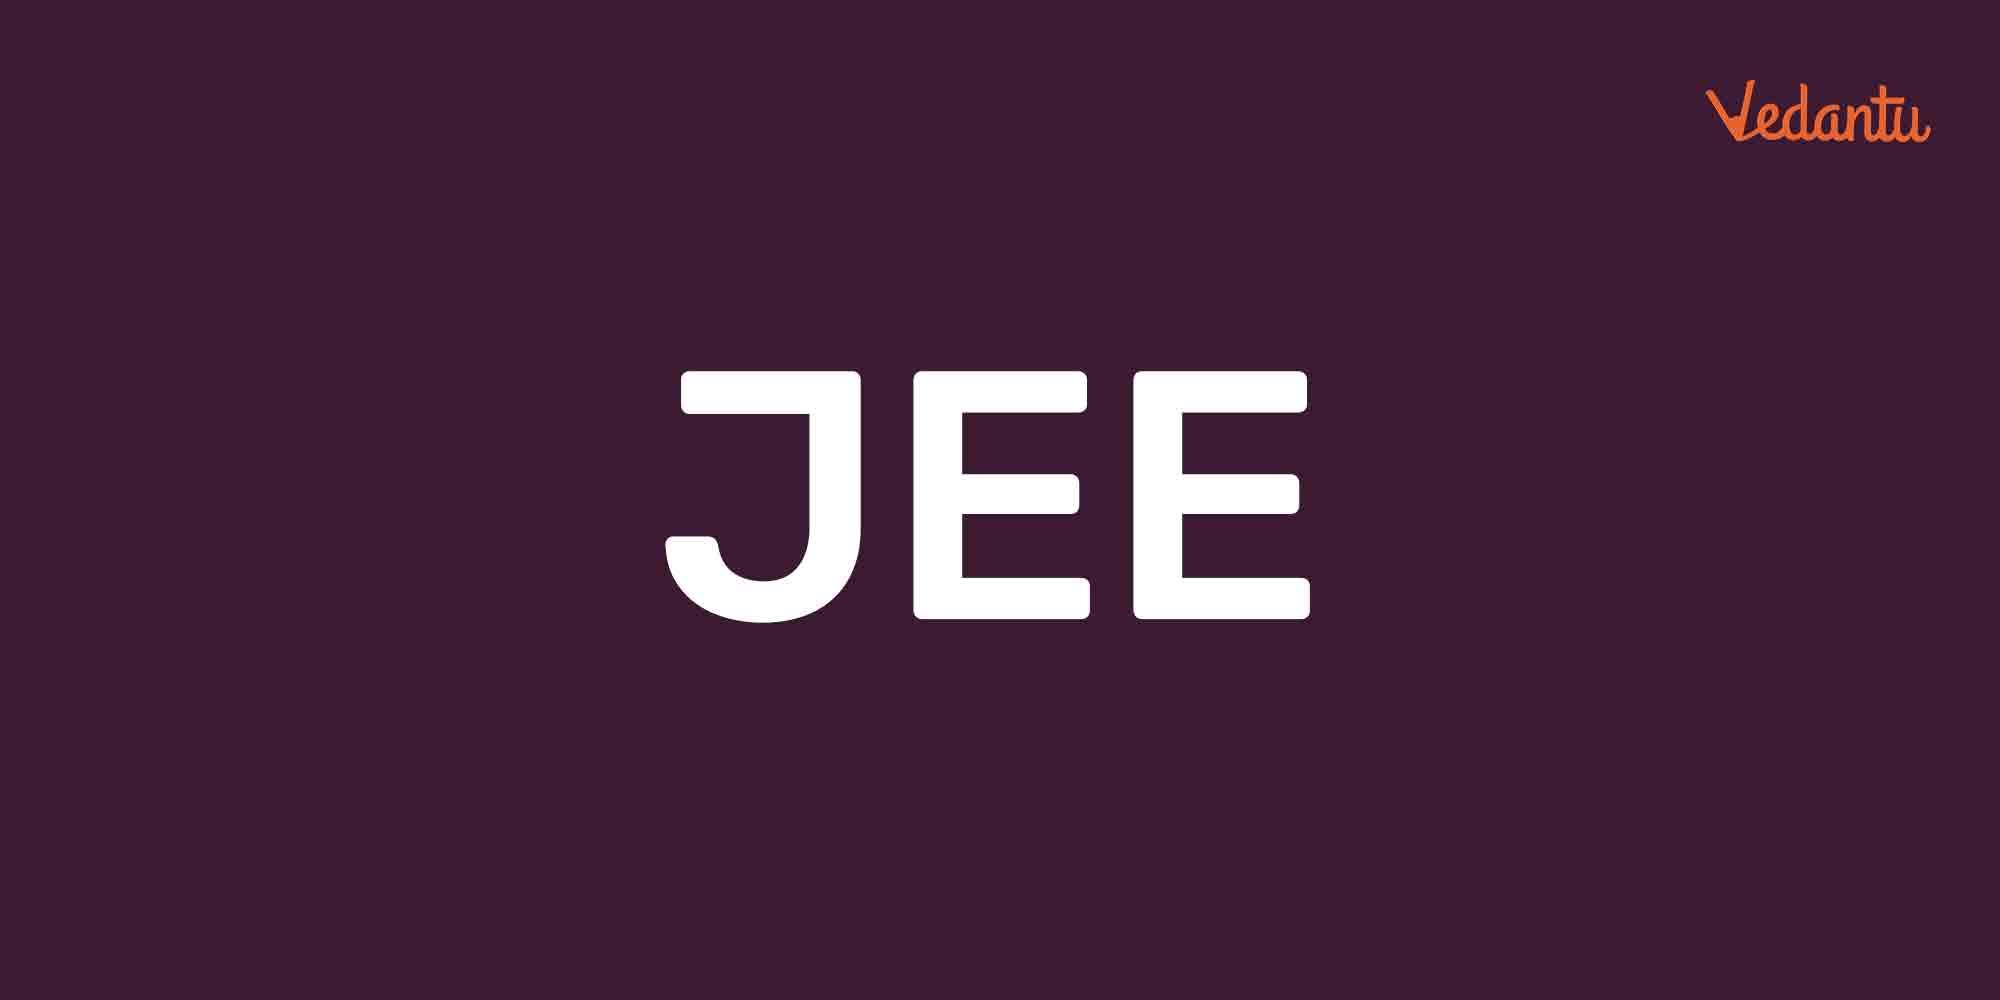 IIT JEE Mathematics Important Topics for JEE Exams